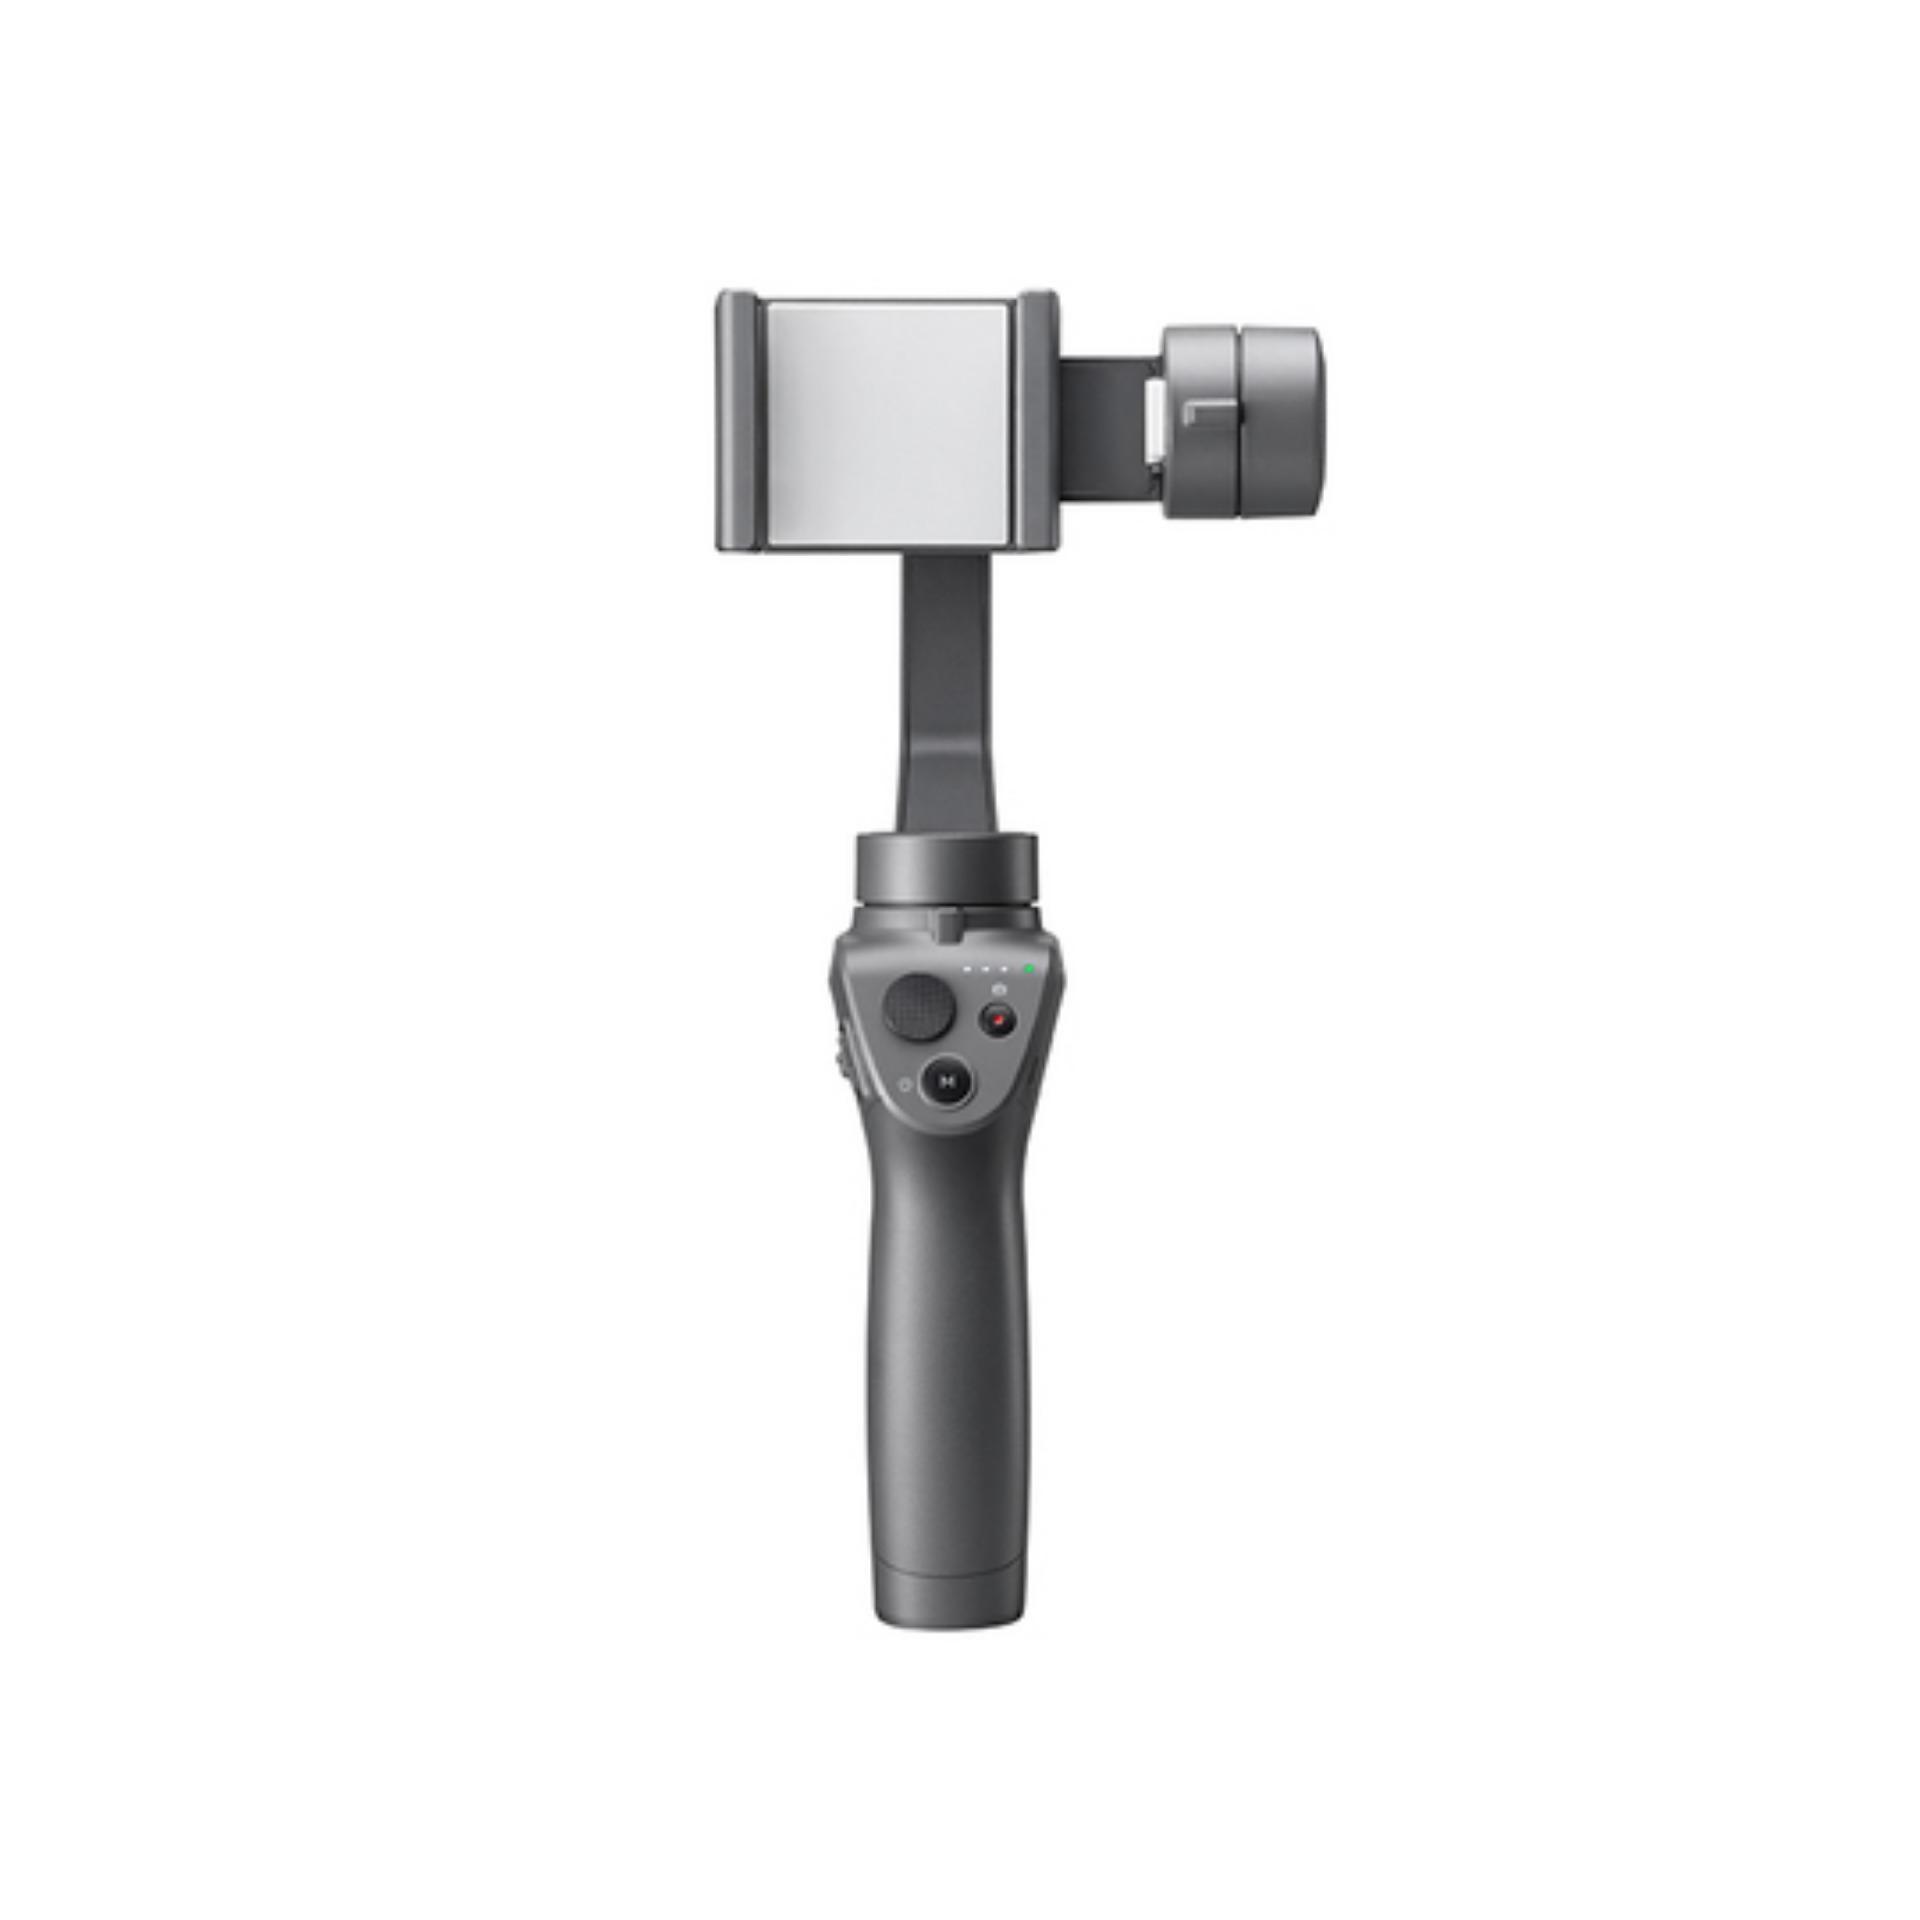 Dji Philippines Price List Camera Drones Accessories Signal Range Booster Amplifier Antenna Phantom 3 4 Inspire 1 2 Pro Advanced Osmo Mobile Handheld Imaging Solution Black